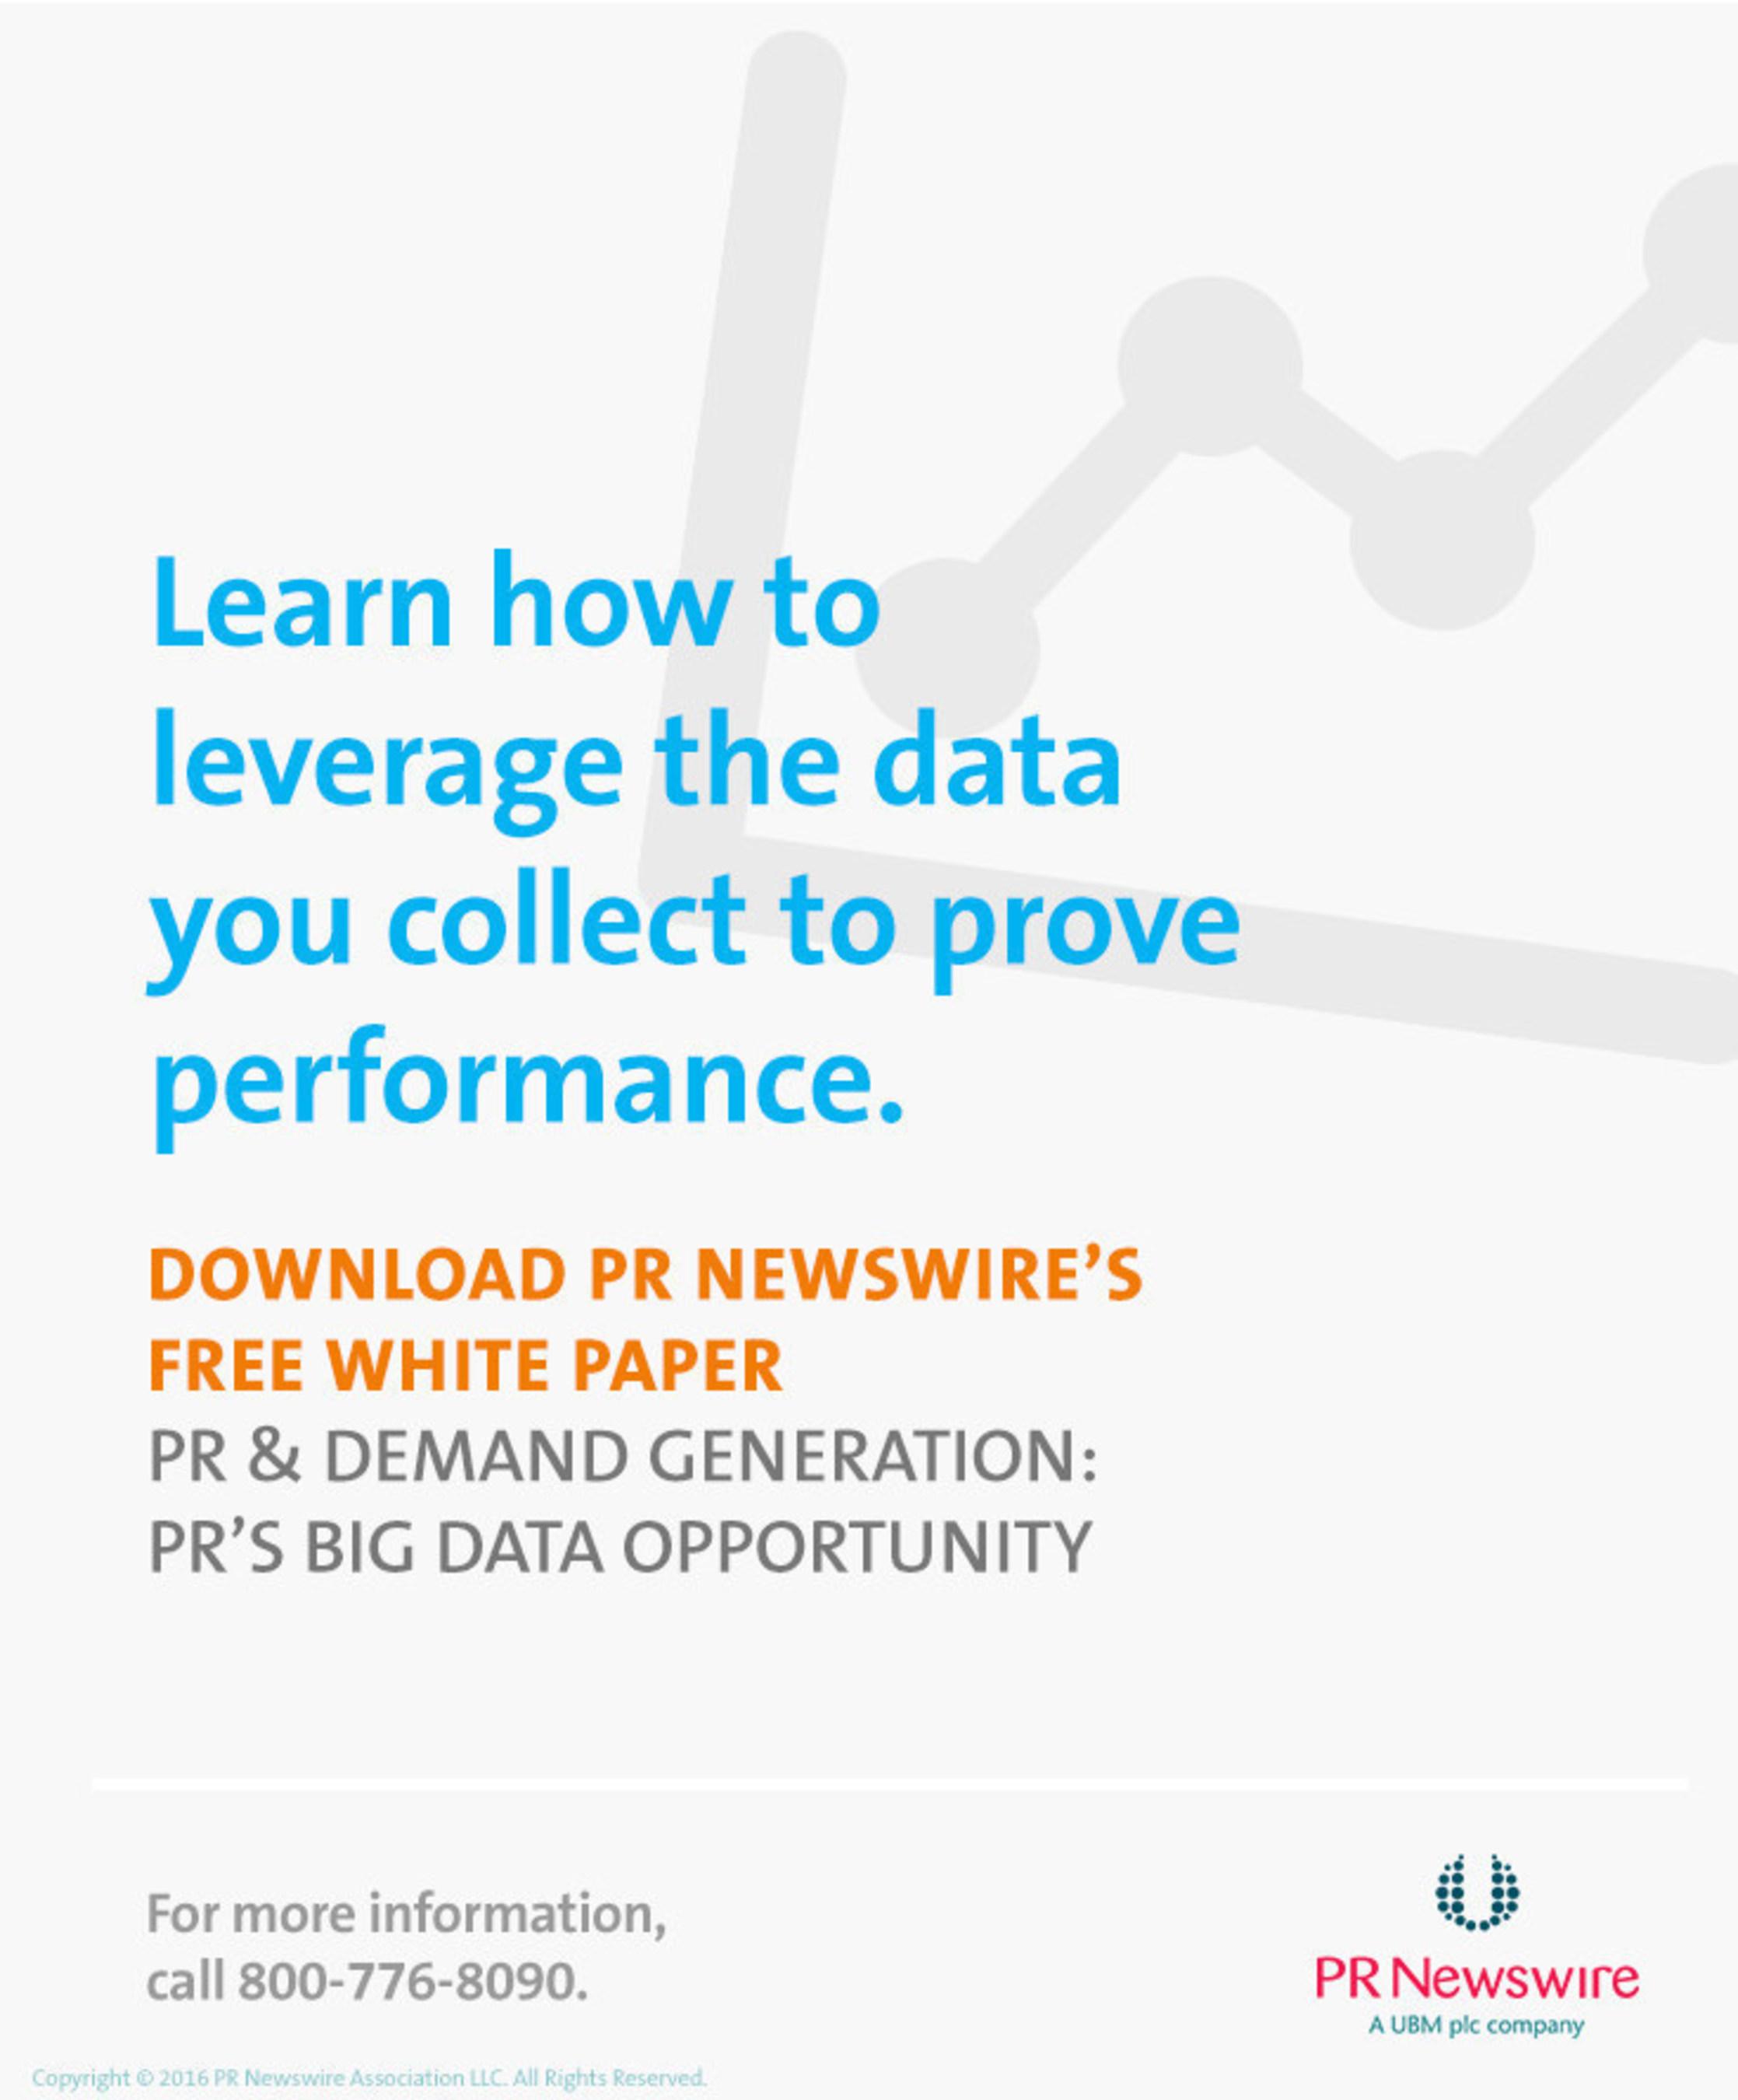 PR Newswire White Paper Helps PR Professionals Use Big Data to Create Successful Campaigns